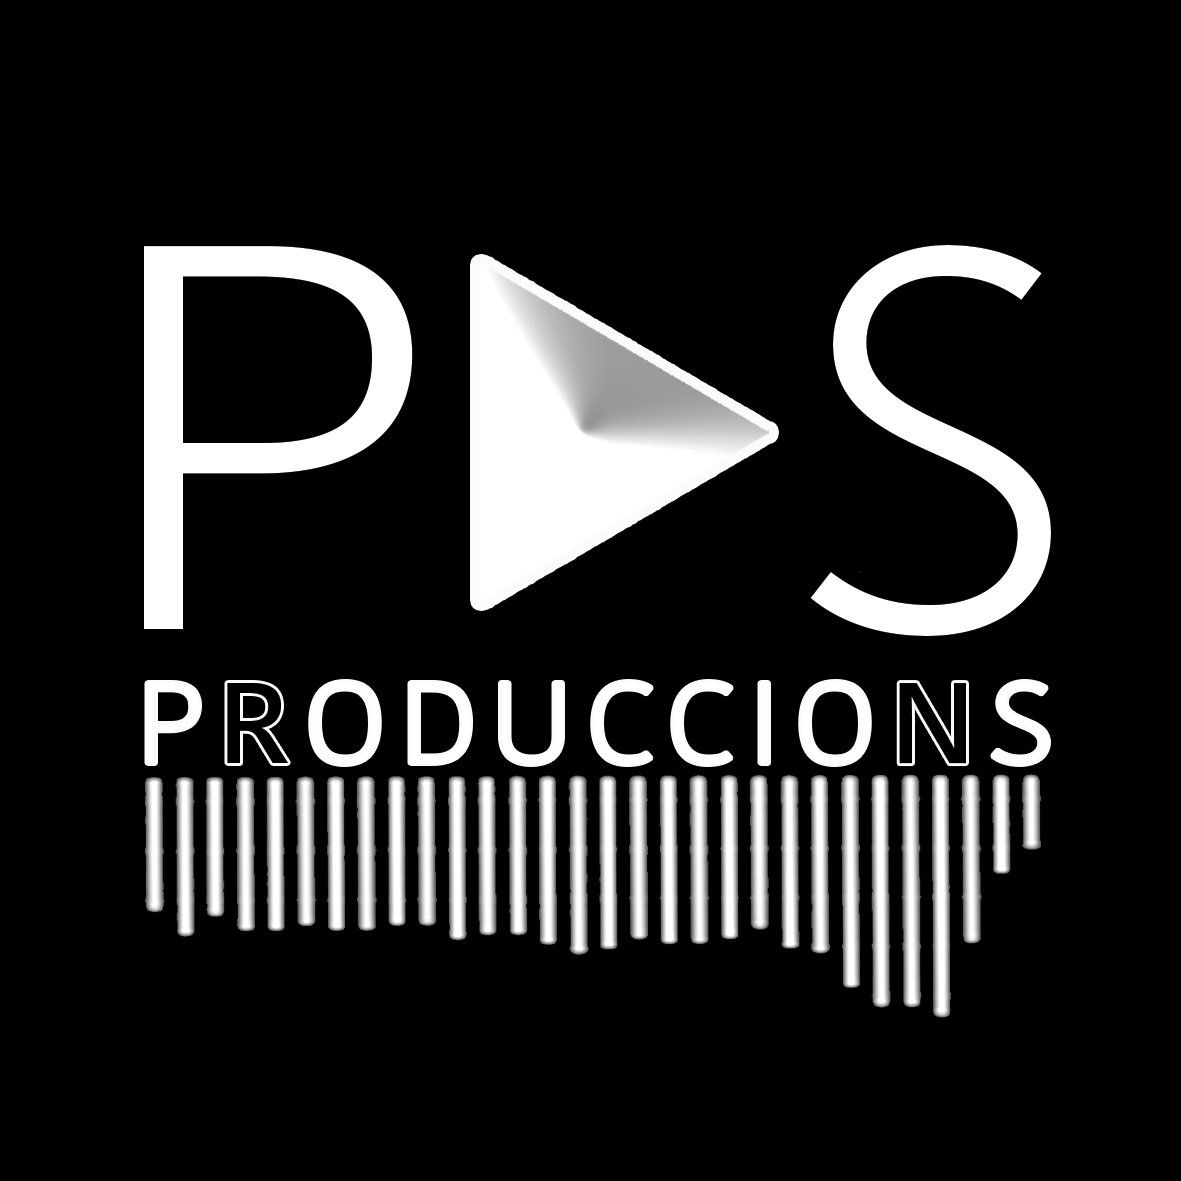 pasproduccions.com